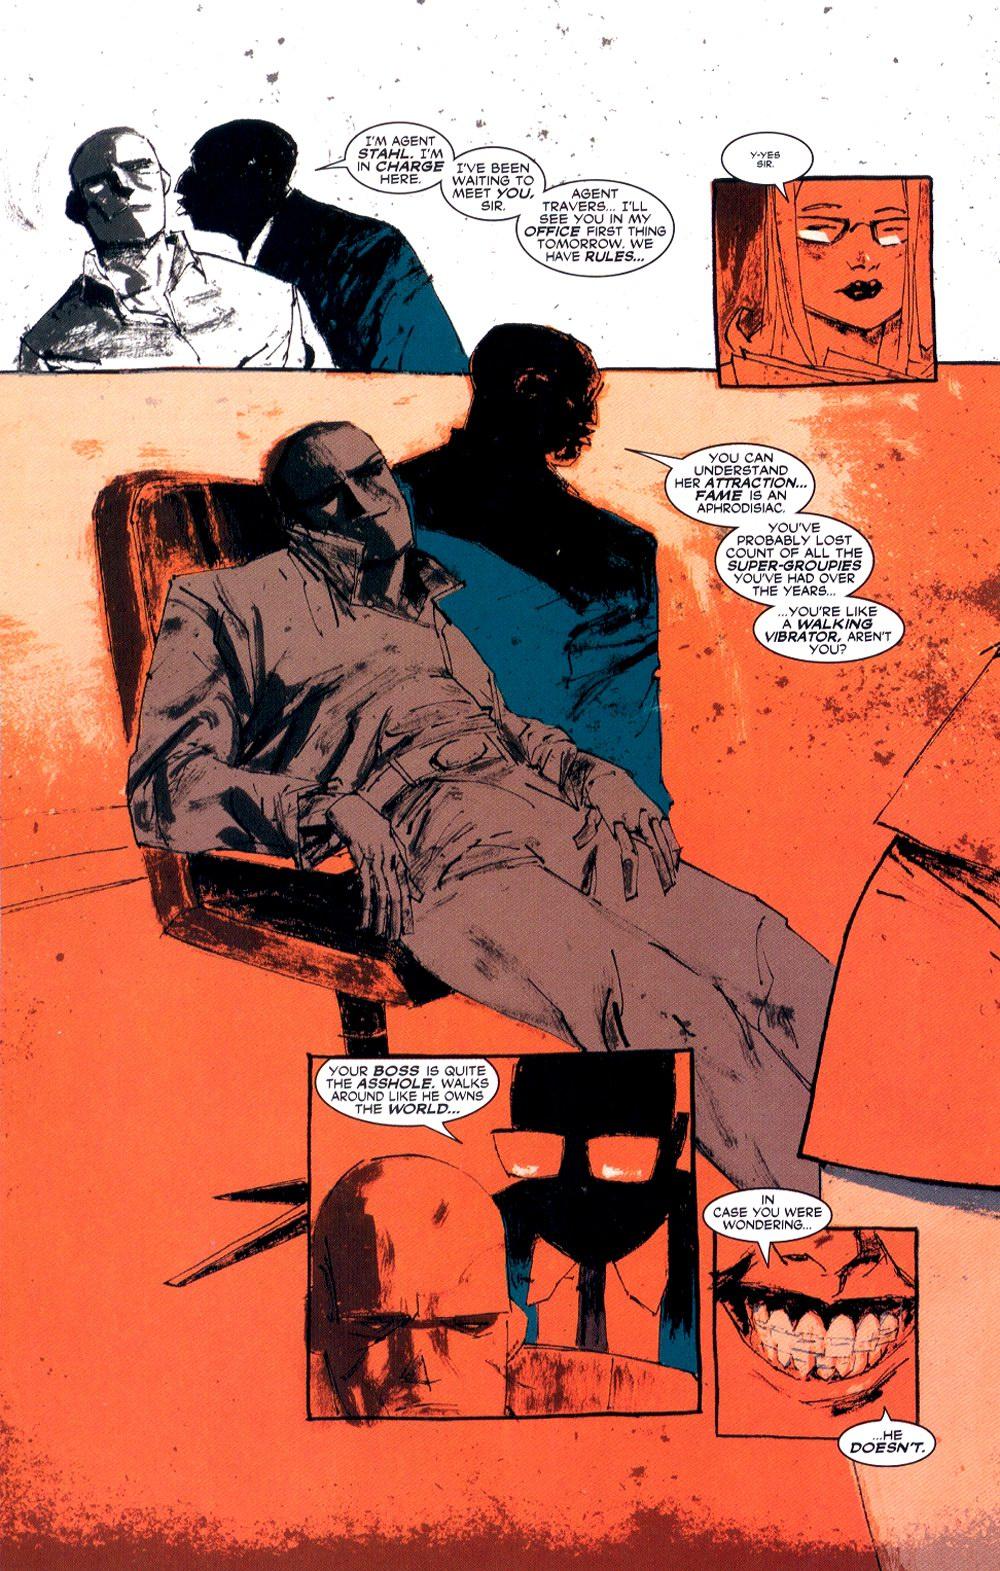 Read online Automatic Kafka comic -  Issue #3 - 10